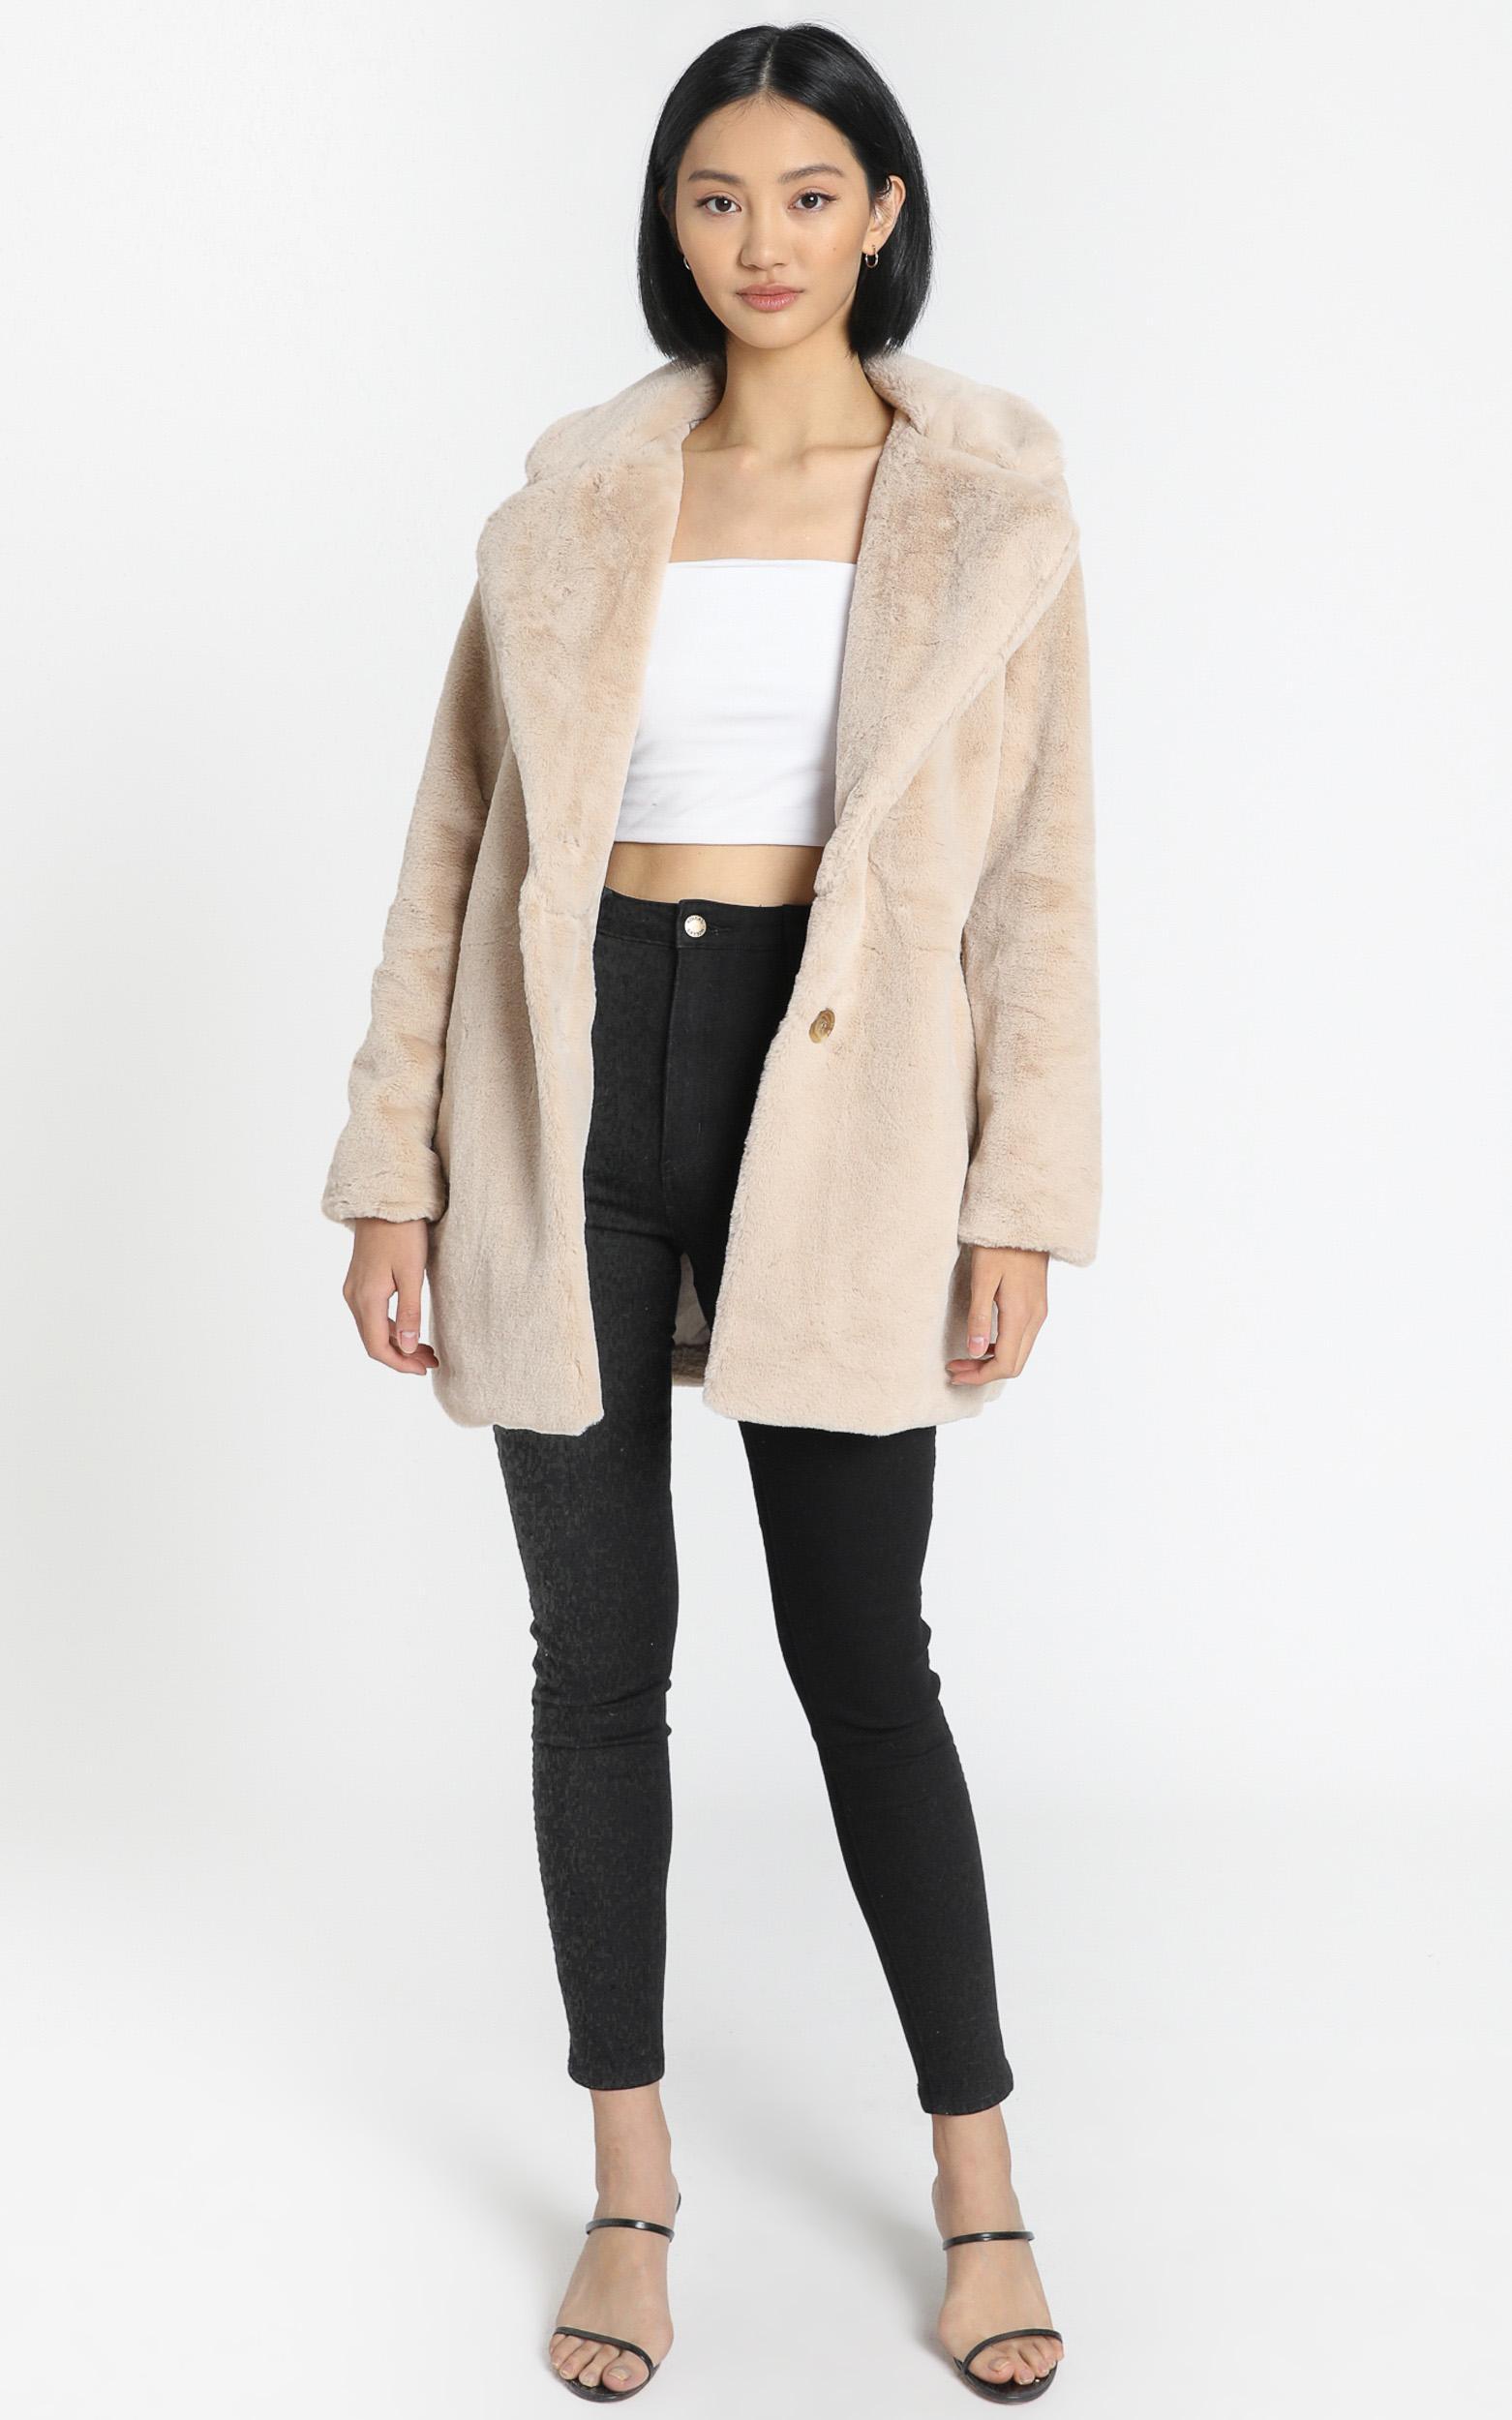 Noah Faux Fur Coat in Beige - 8 (S), Beige, hi-res image number null